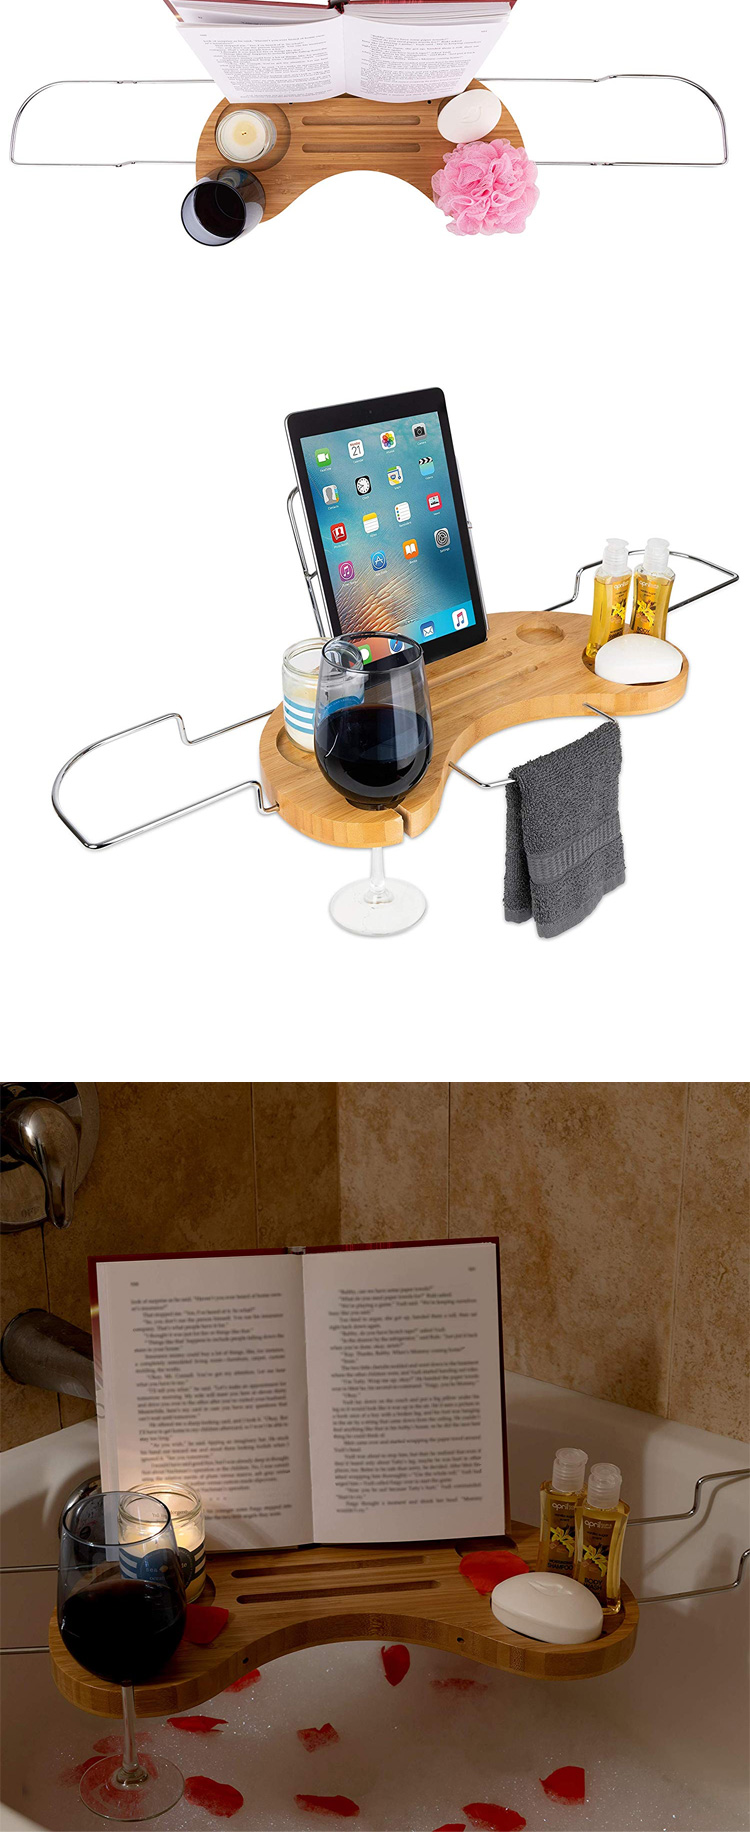 Luxury Bathtub Caddy Tray  Bamboo Expandable Organizer With Detachable Tablet Backrest 3